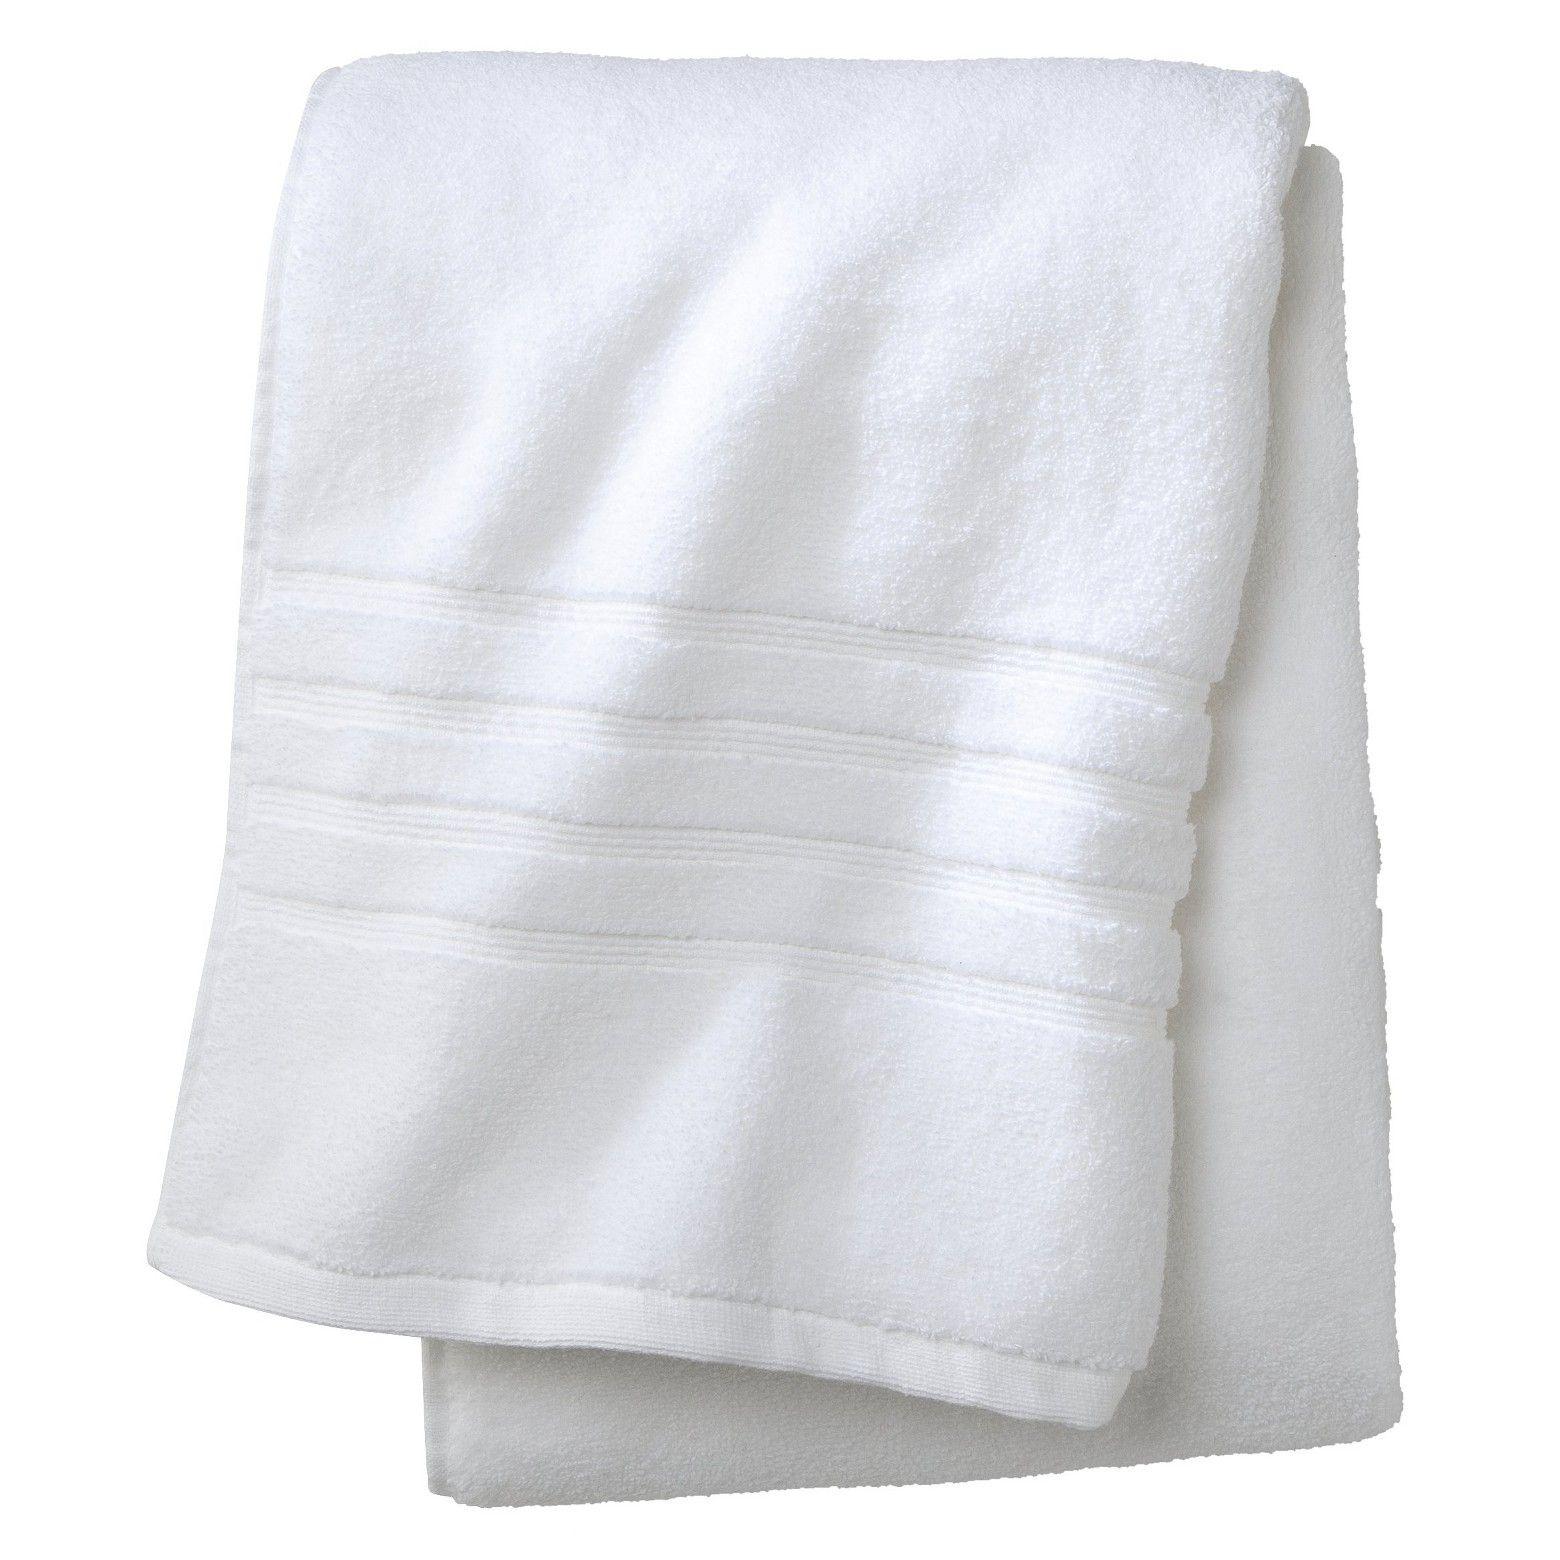 What Is A Bath Sheet Luxury Bath Sheet True White  Fieldcrest  Towels Bath And Beach